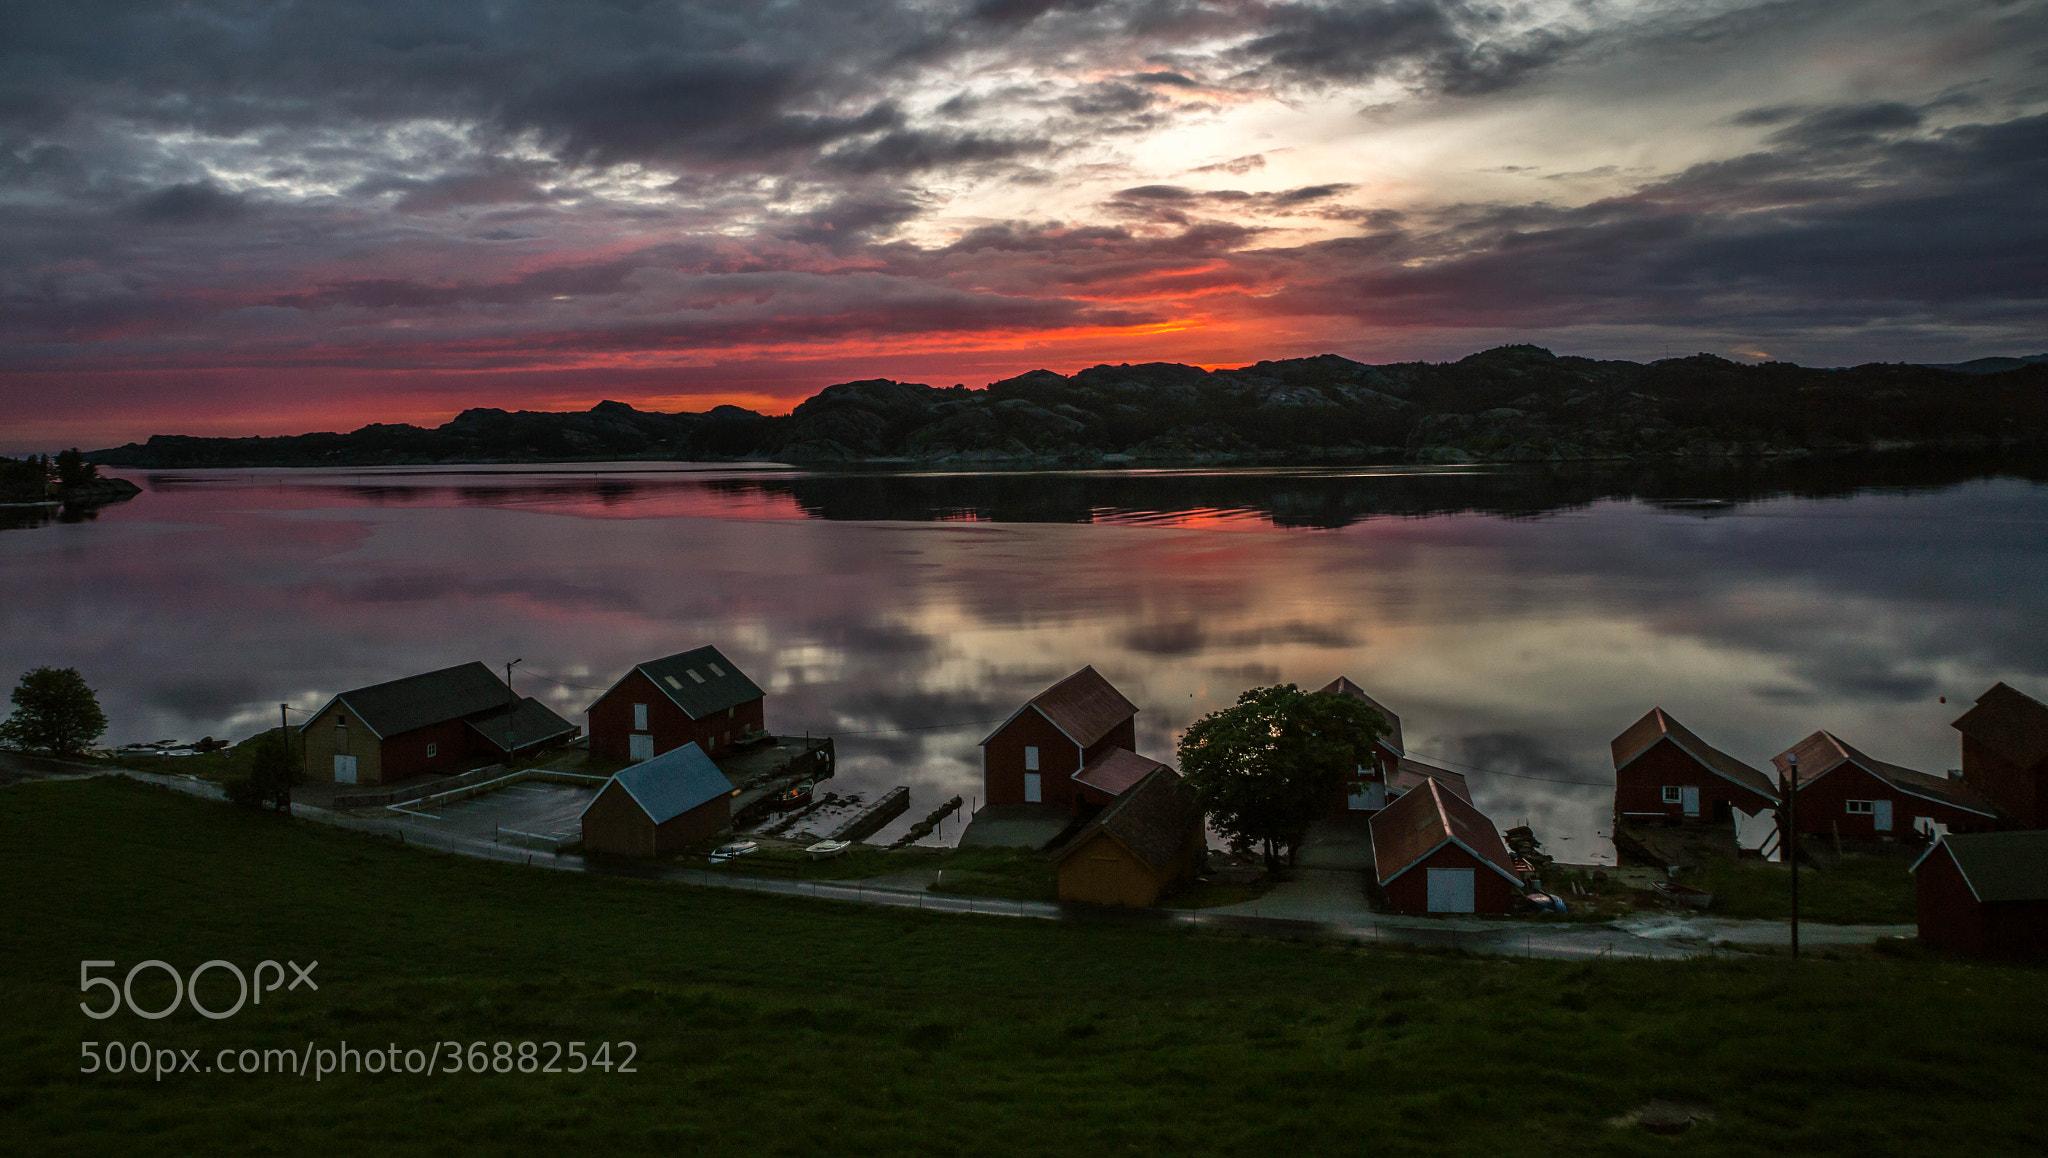 Photograph Another Skadberg sunset by Magnus Østebrød on 500px